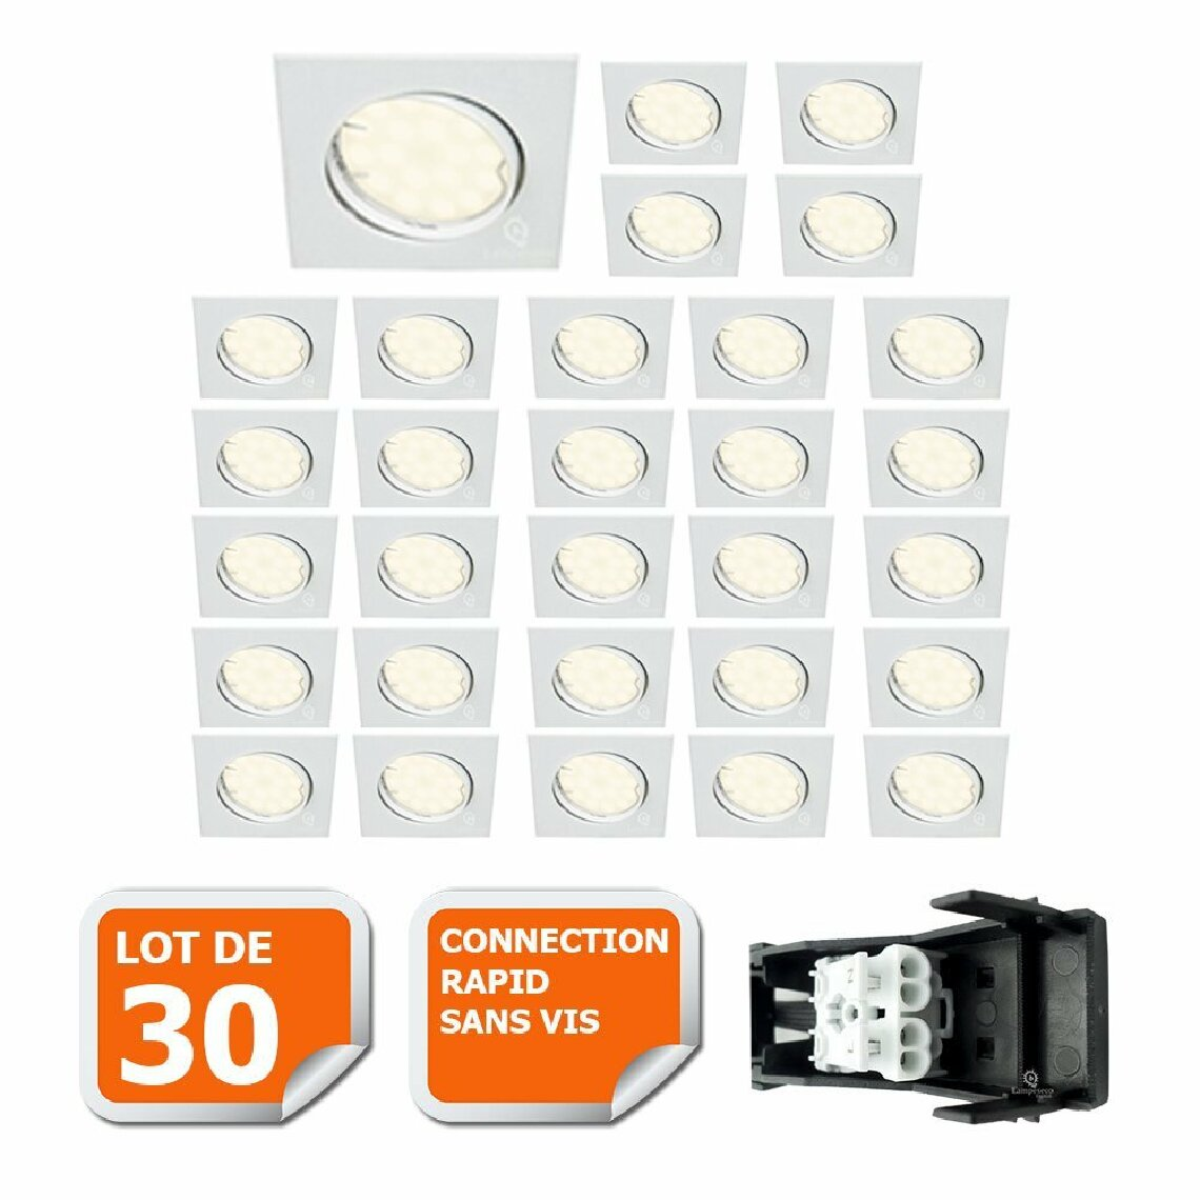 Lampesecoenergie LOT DE 30 SPOT ENCASTRABLE ORIENTABLE CARRE LED SMD GU10 230V BLANC RENDU ENVIRON 50W HALOGENE